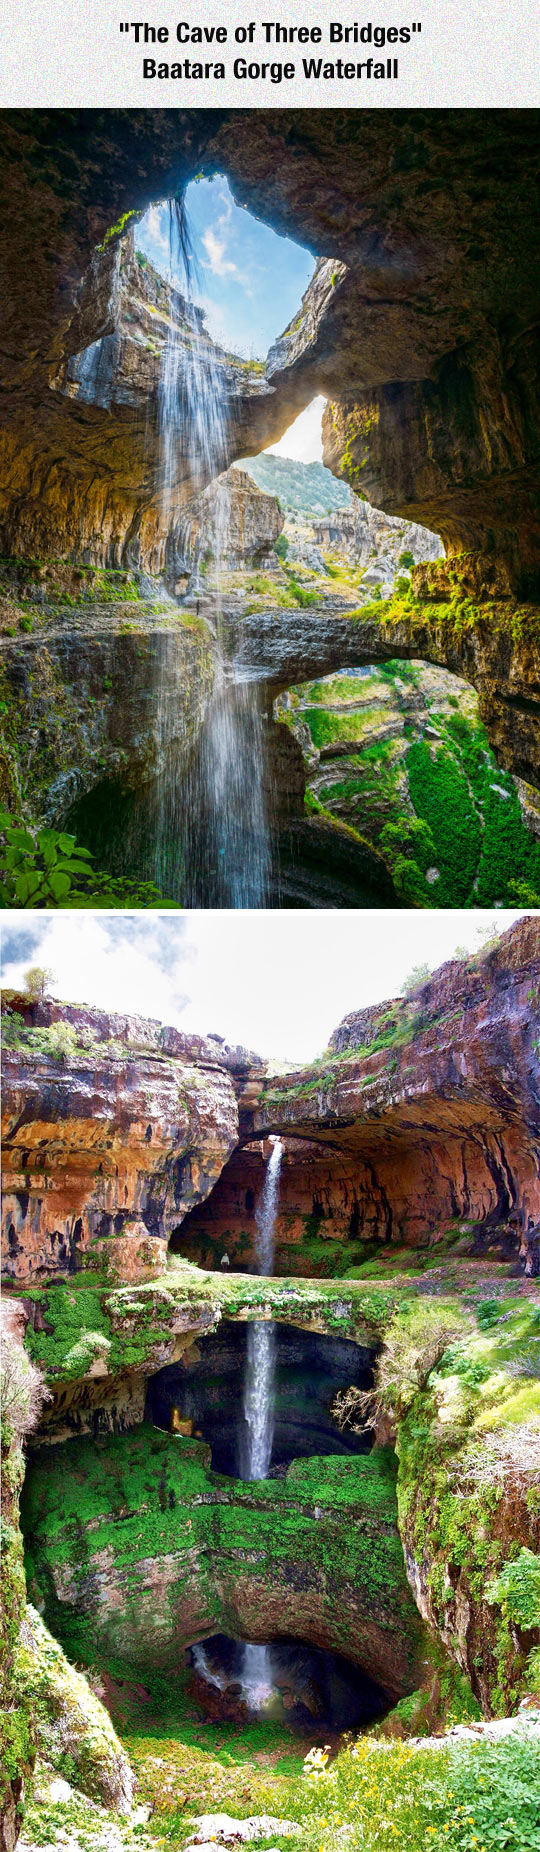 cool-Cave-Bridges-Baatara-Gorge-waterfall